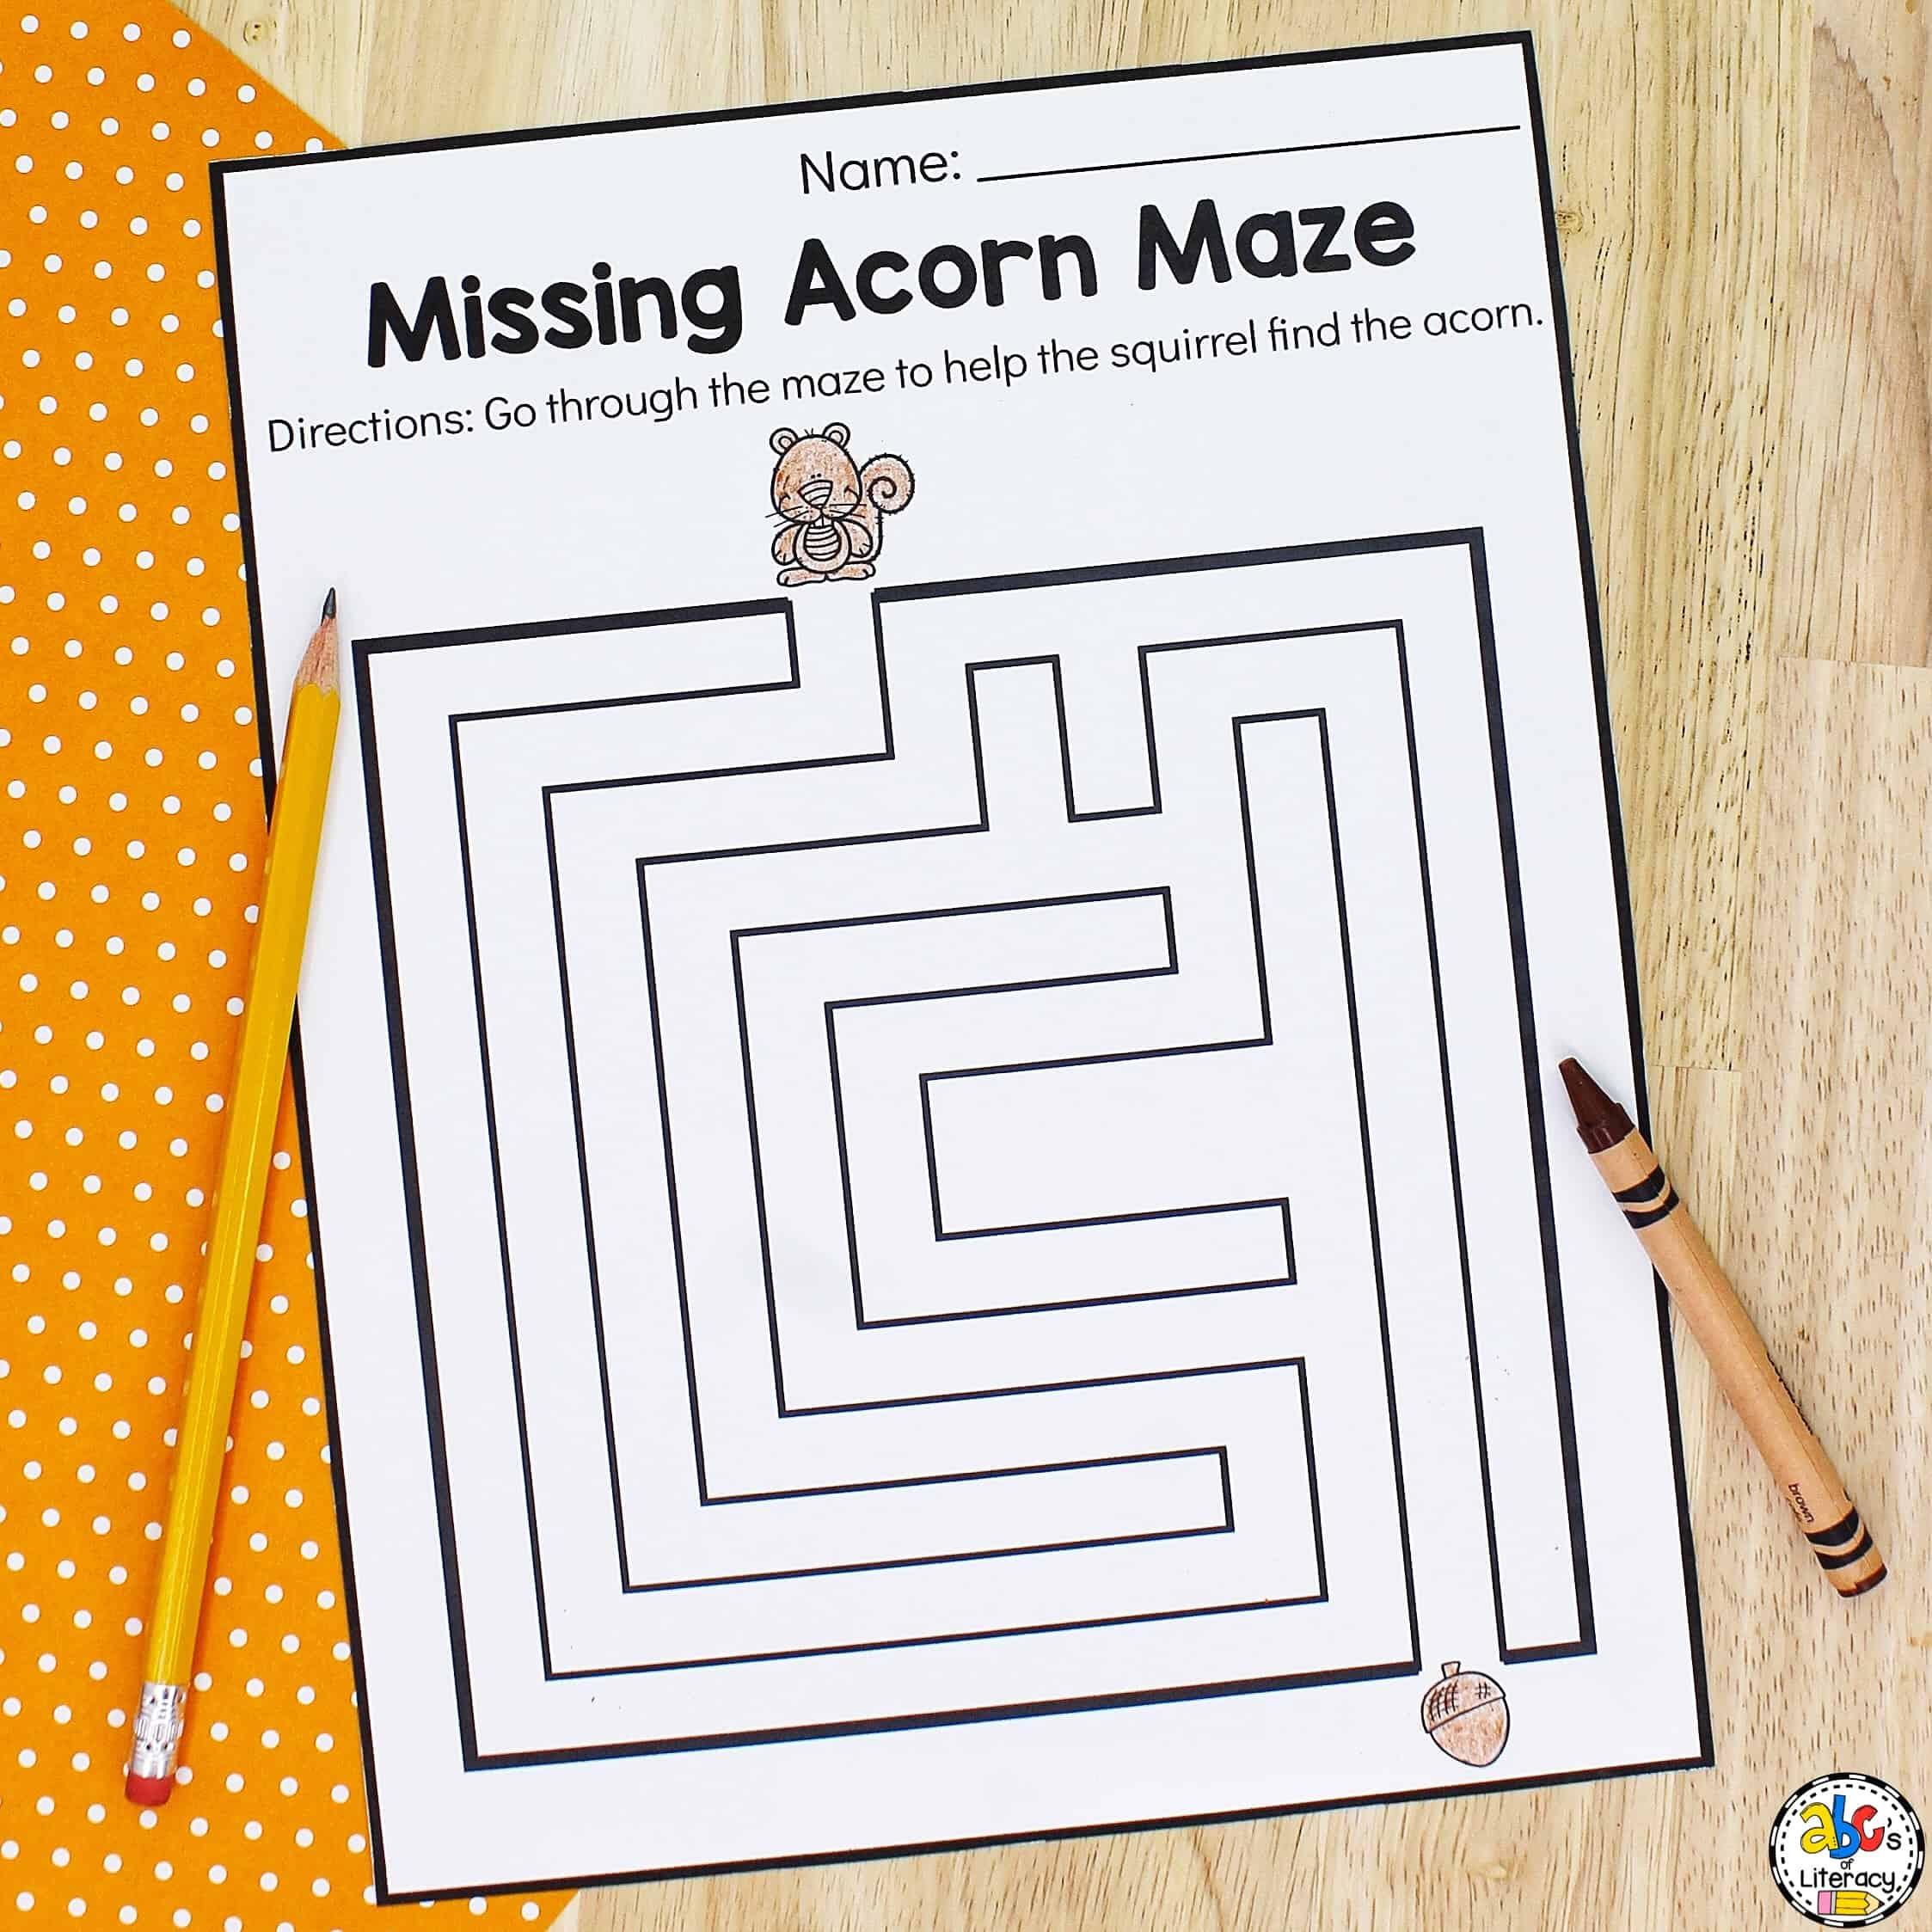 Worksheets for Preschoolers